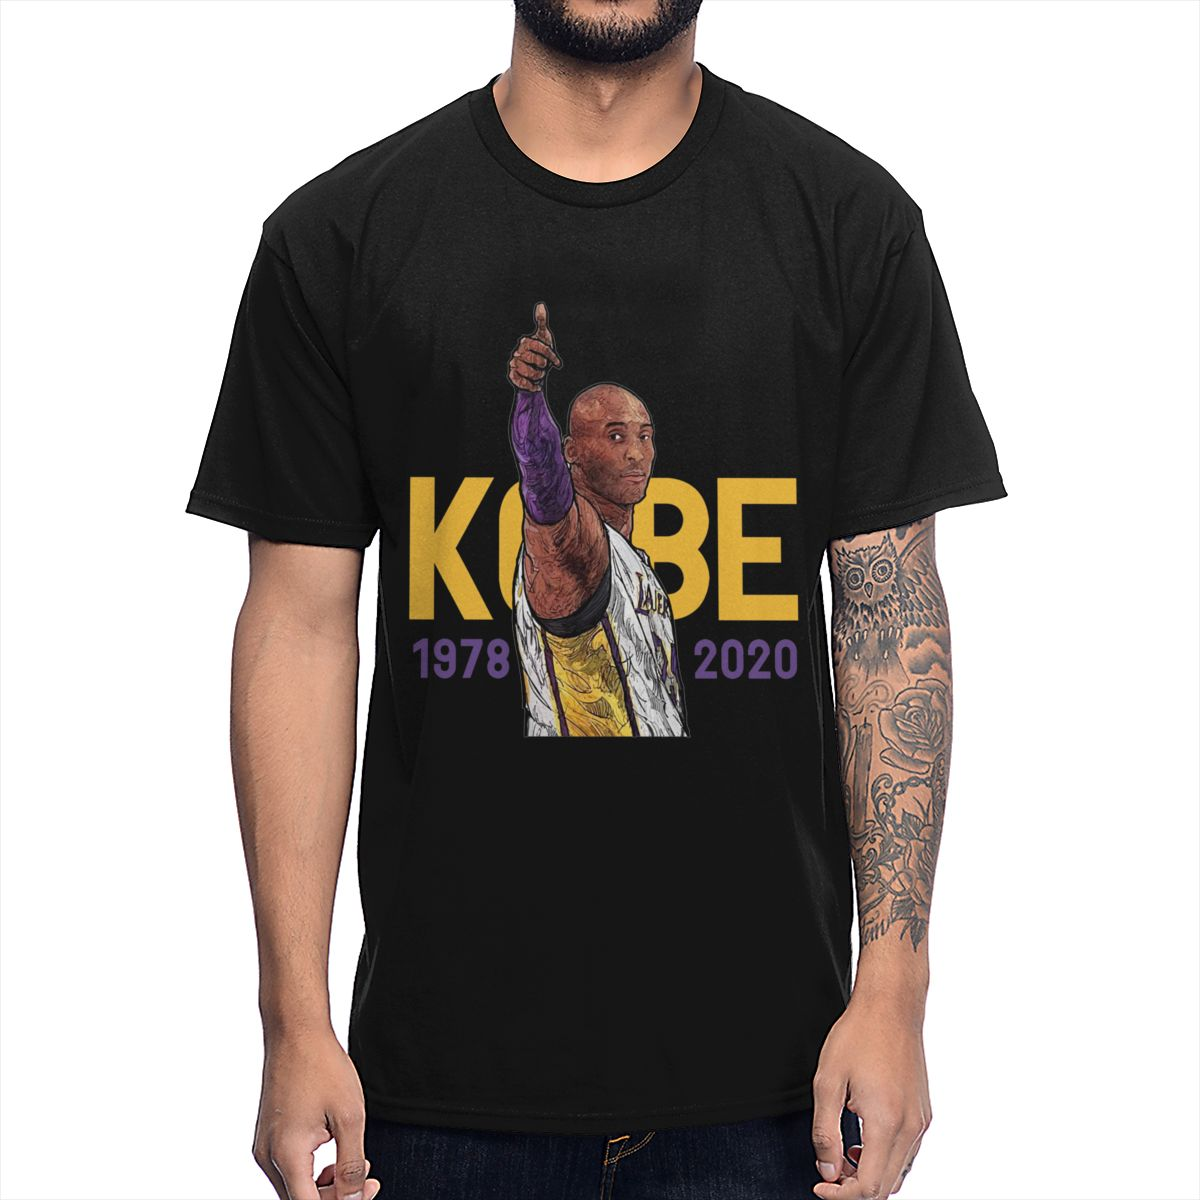 Rip Kobe Bryan T Shirt New Arrival O-neck Cotton T-shirt